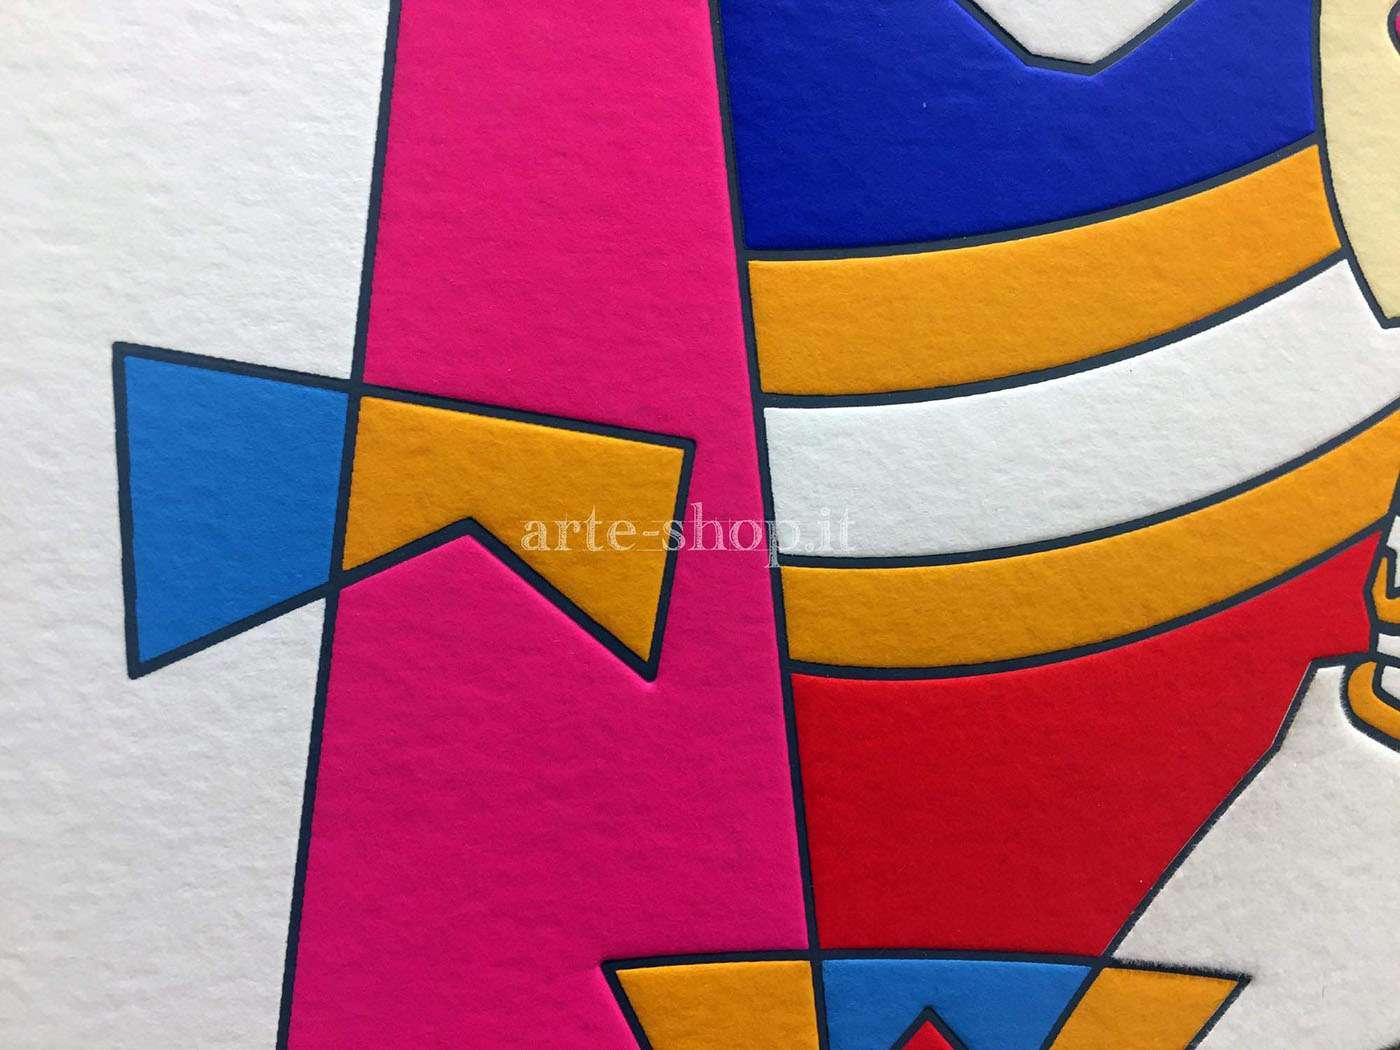 arte pentagono shop dettaglio numero 381